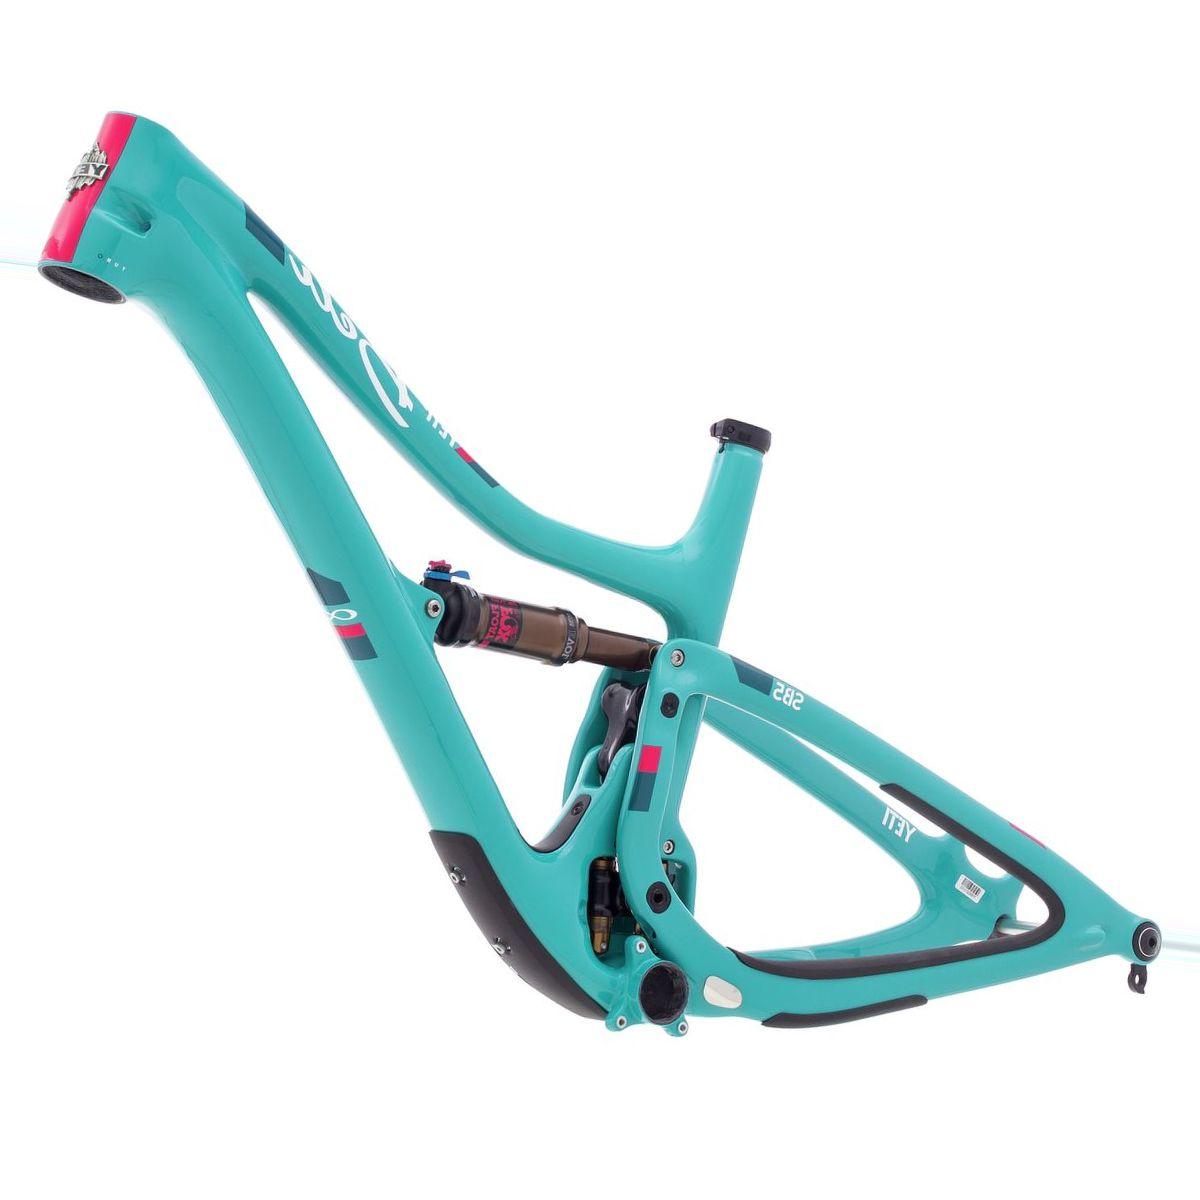 Yeti Cycles Beti SB5 Turq Mountain Bike Frame - 2018 - Women's